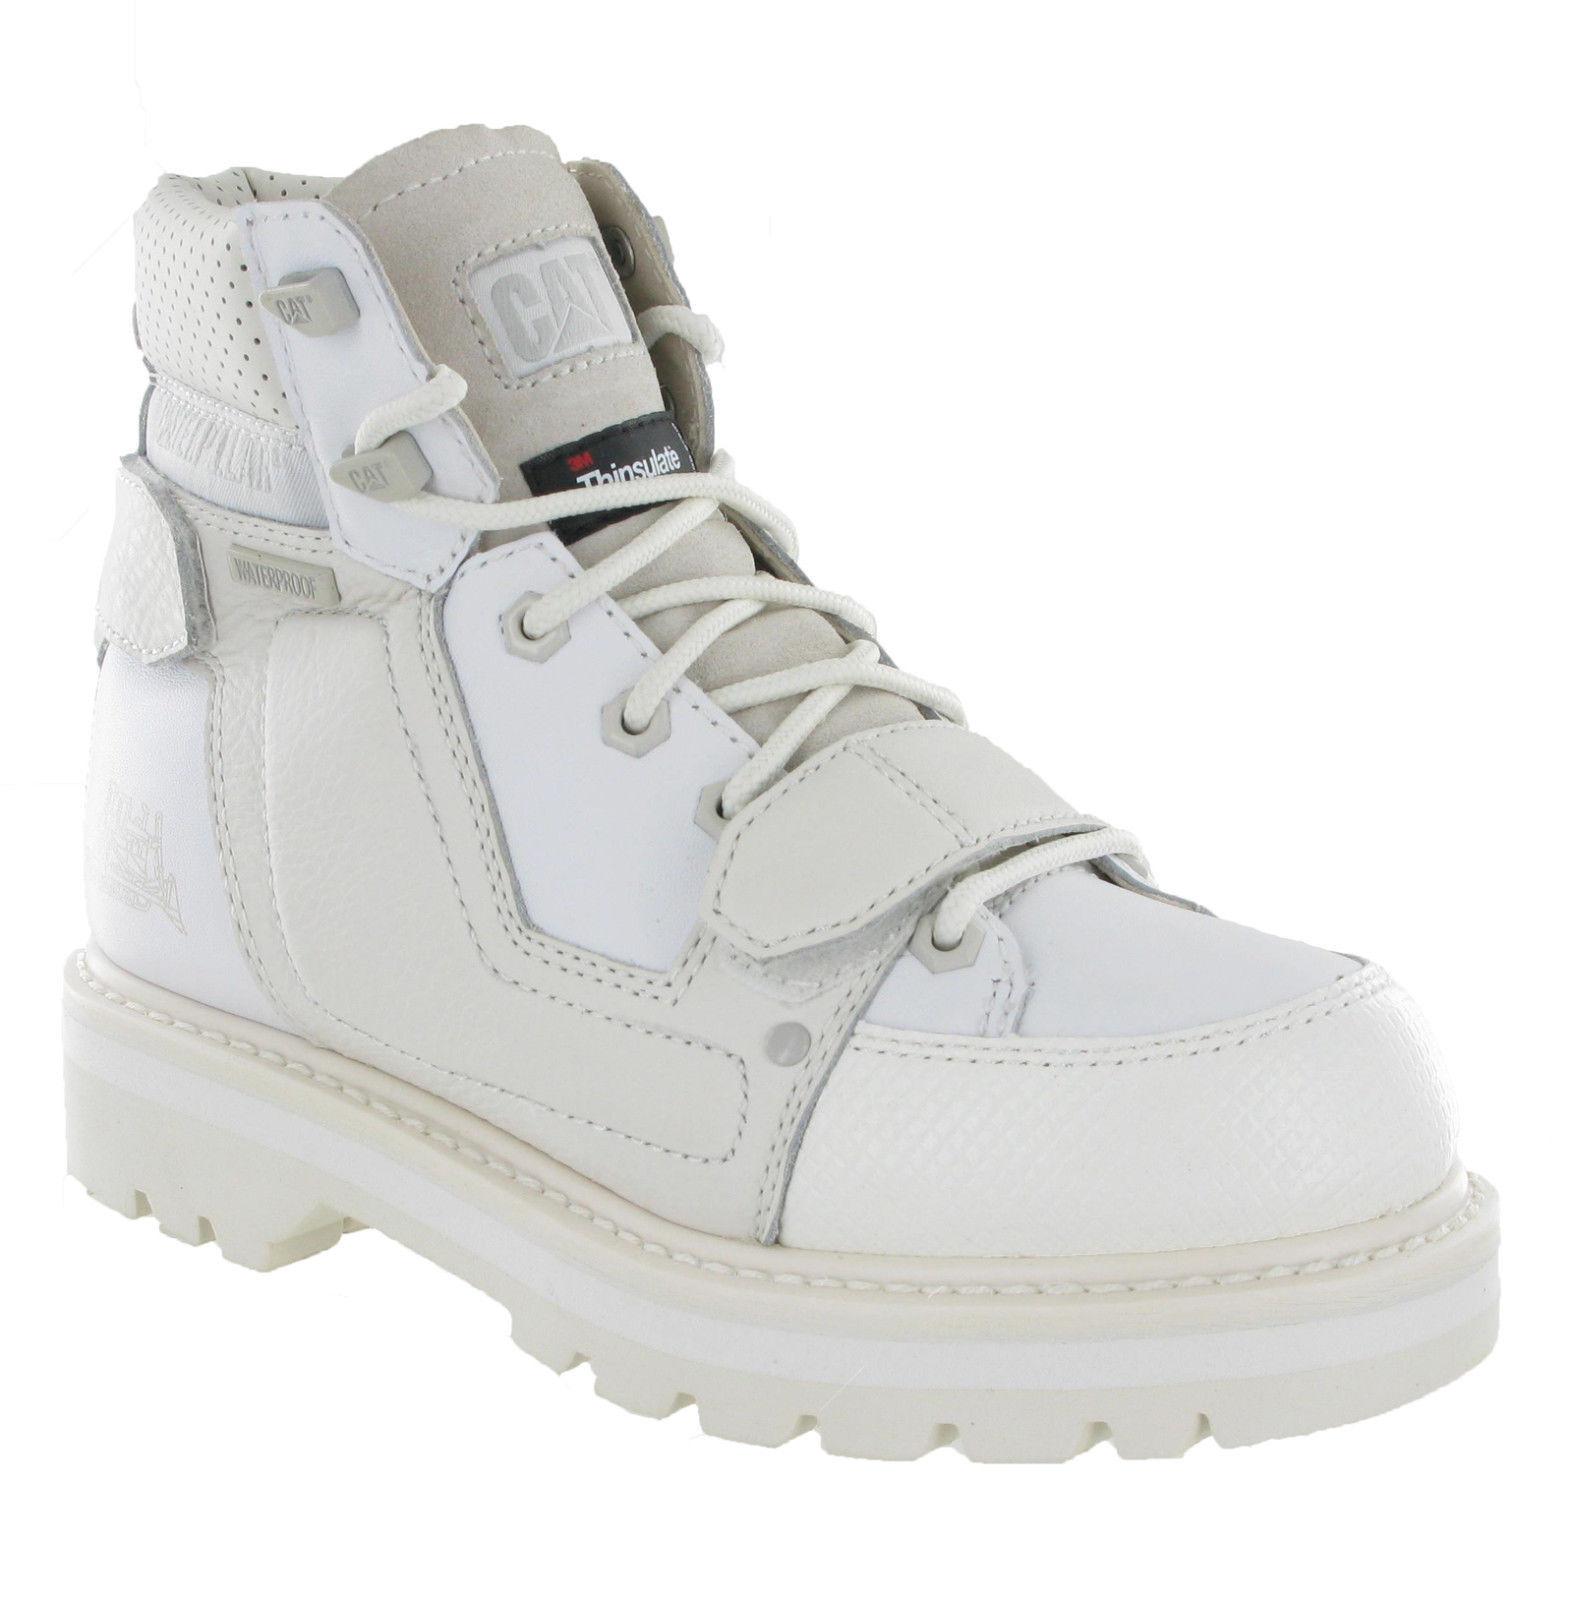 Caterpillar CAT Volt Mid Leather Lace Up Hombre Fashion Fashion Fashion HI-Top Ankle botas 855471